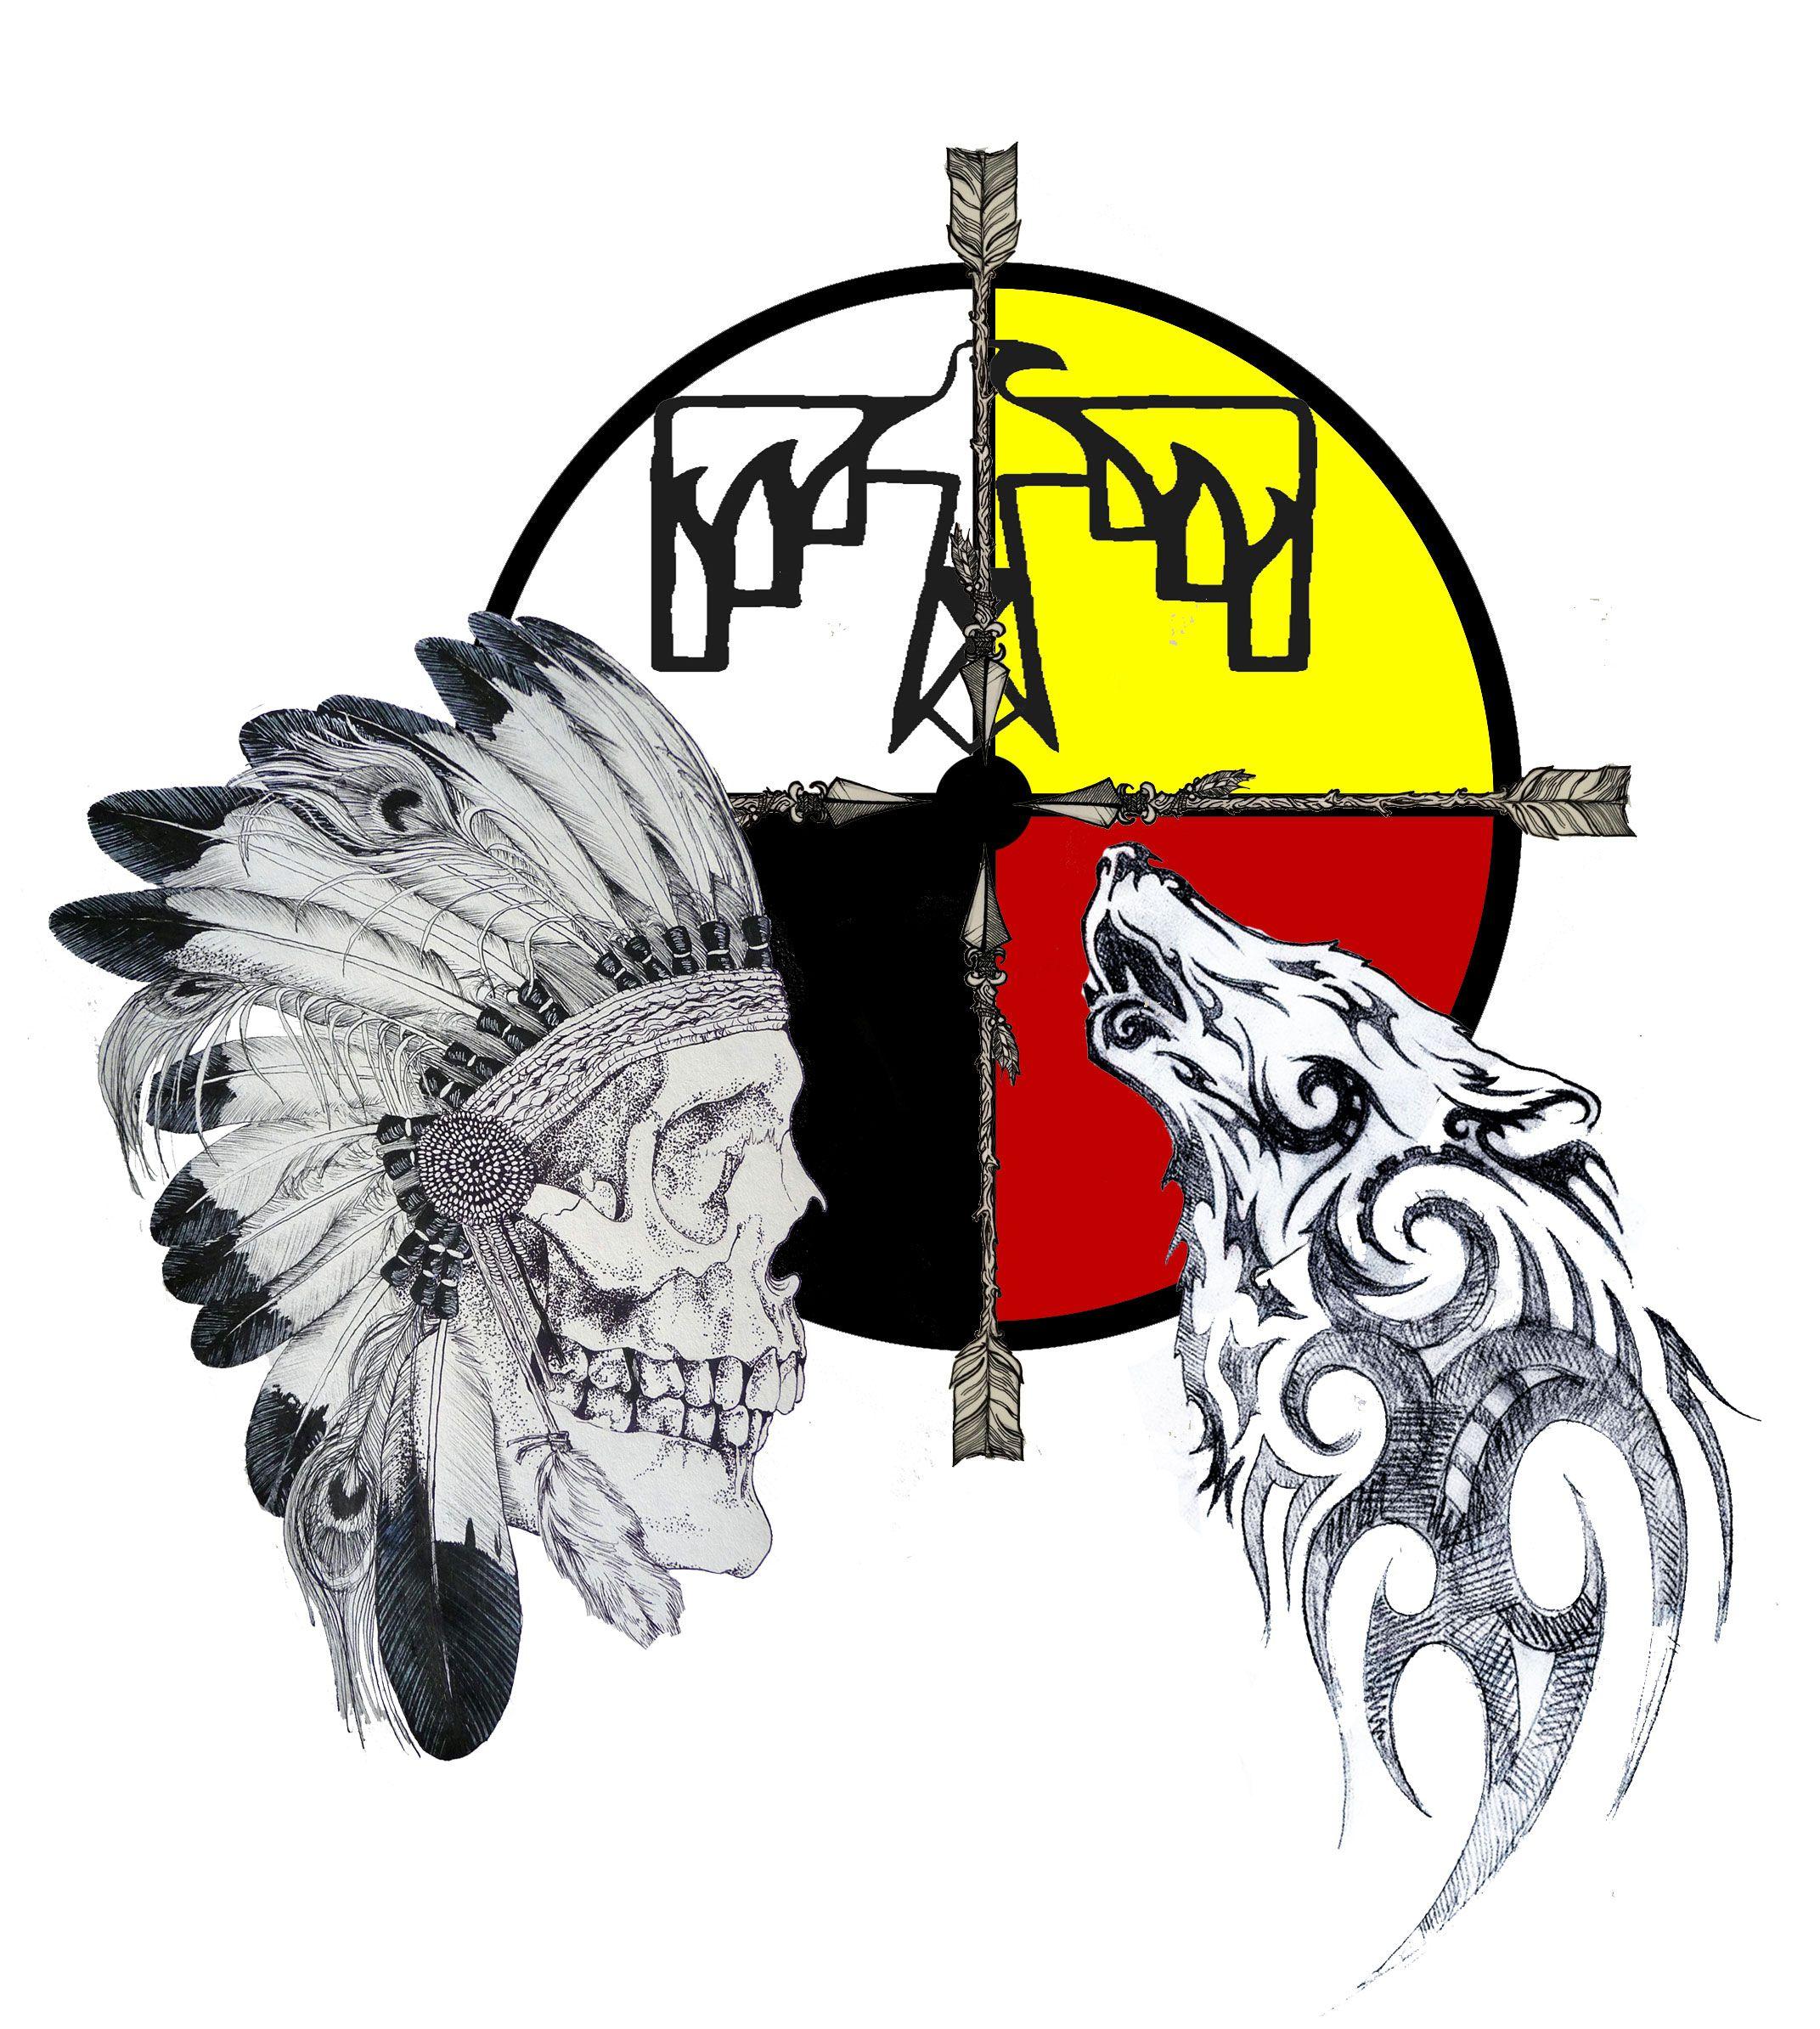 328c5af613fbc Lakota spirit wheel, tribal wolf, and thunderbird. | Tattoos | Cherokee indian  tattoos, Tribal wolf, Tribal tattoos